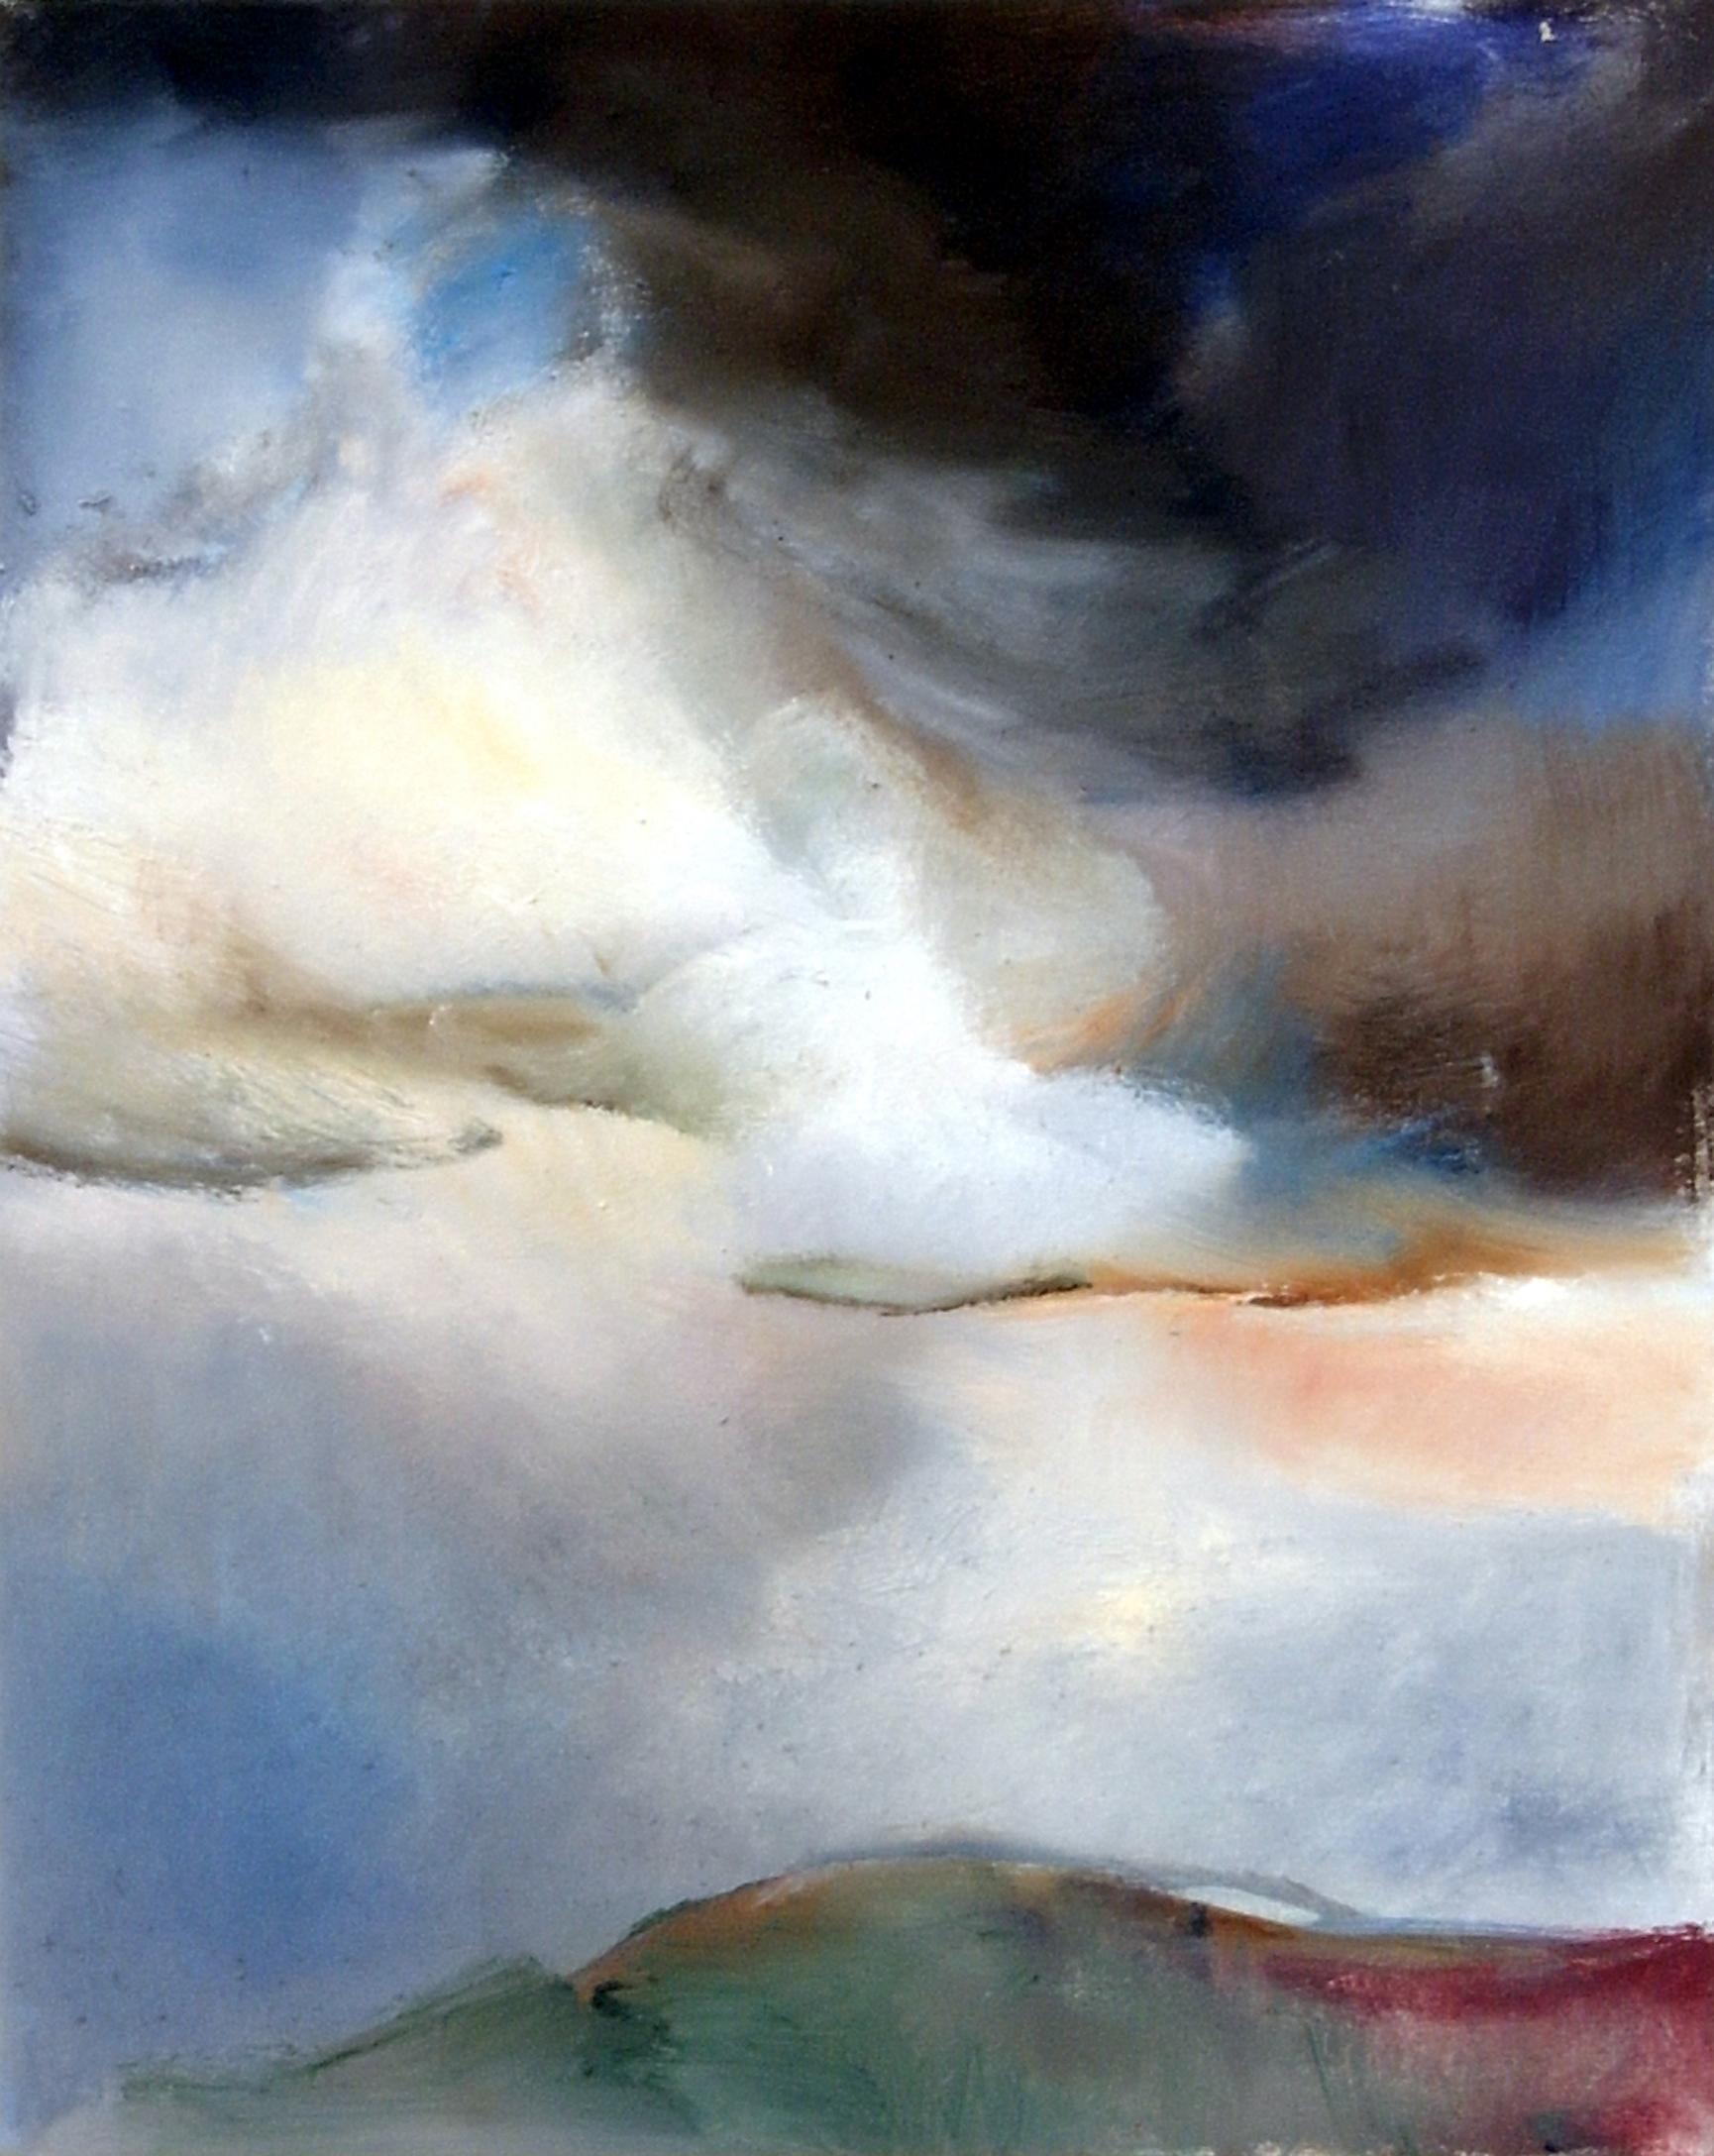 004 Clouds V 2005